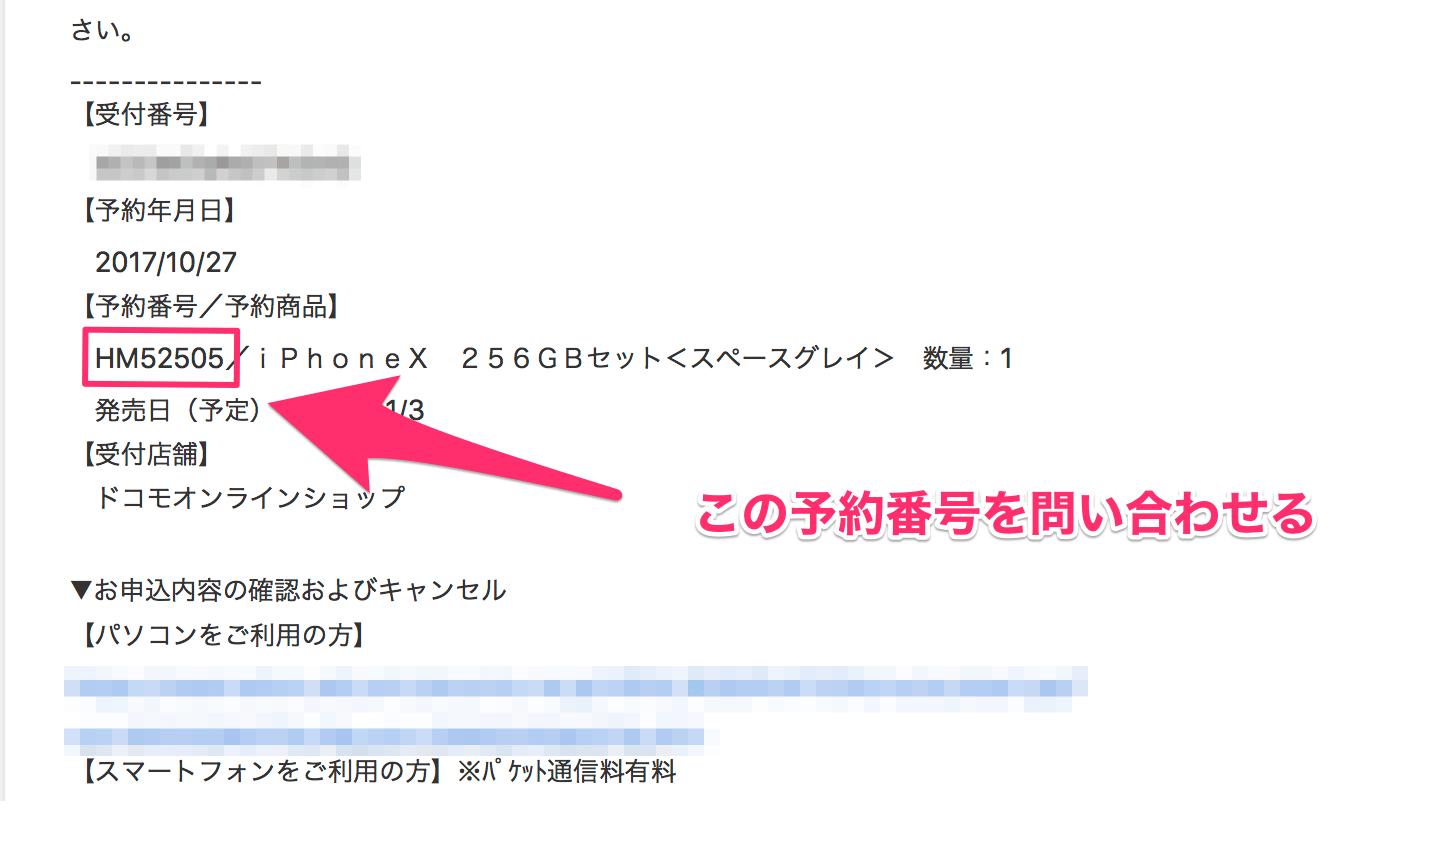 Docomo iPhone reservation order1